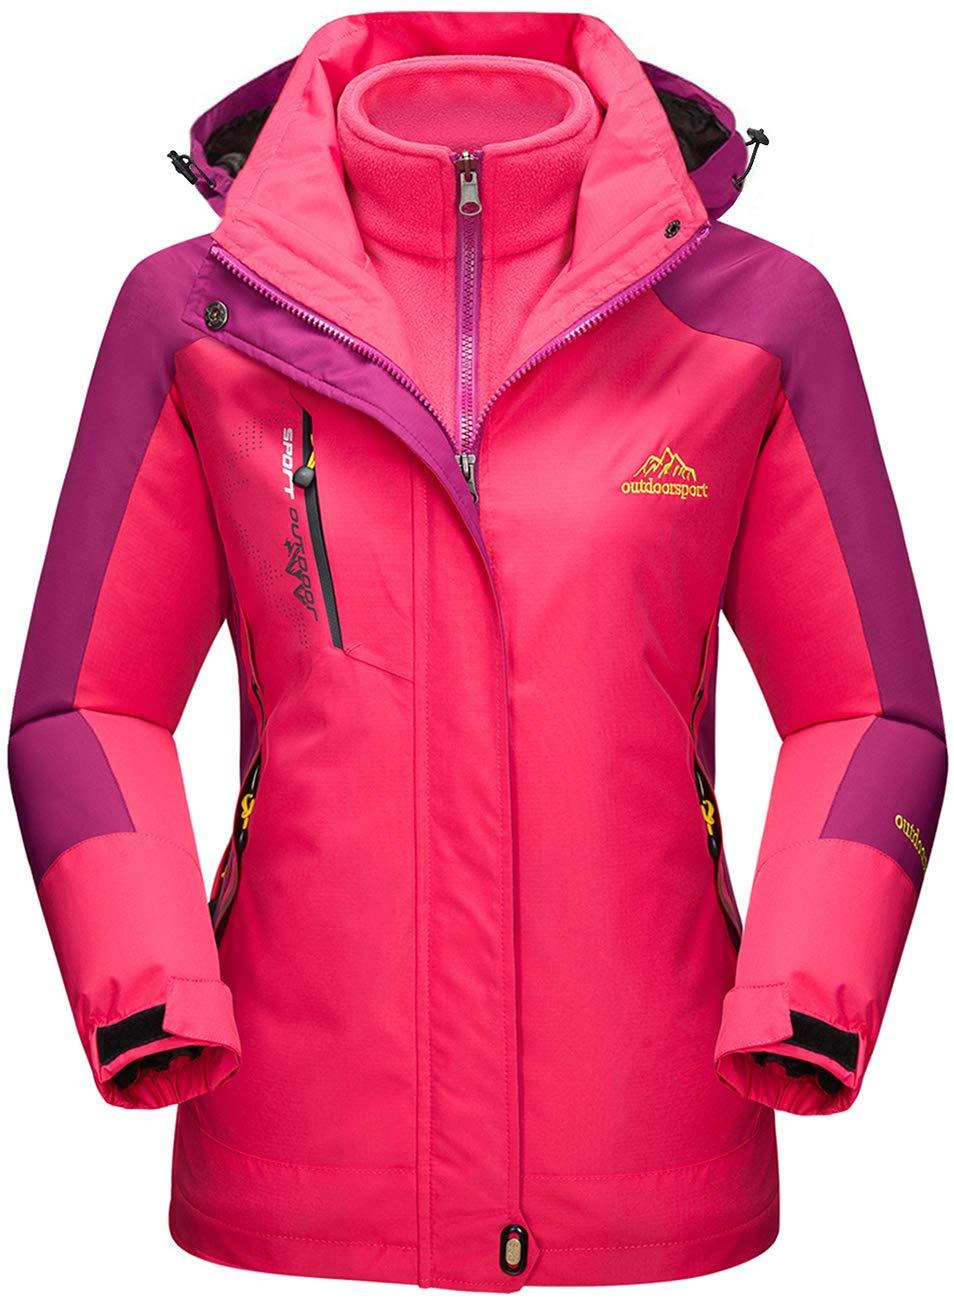 TACVASEN Veste Outdoor 3 en 1 Femme Polaire Imperm/éable Manteau de Snowboard de Ski en Plein air